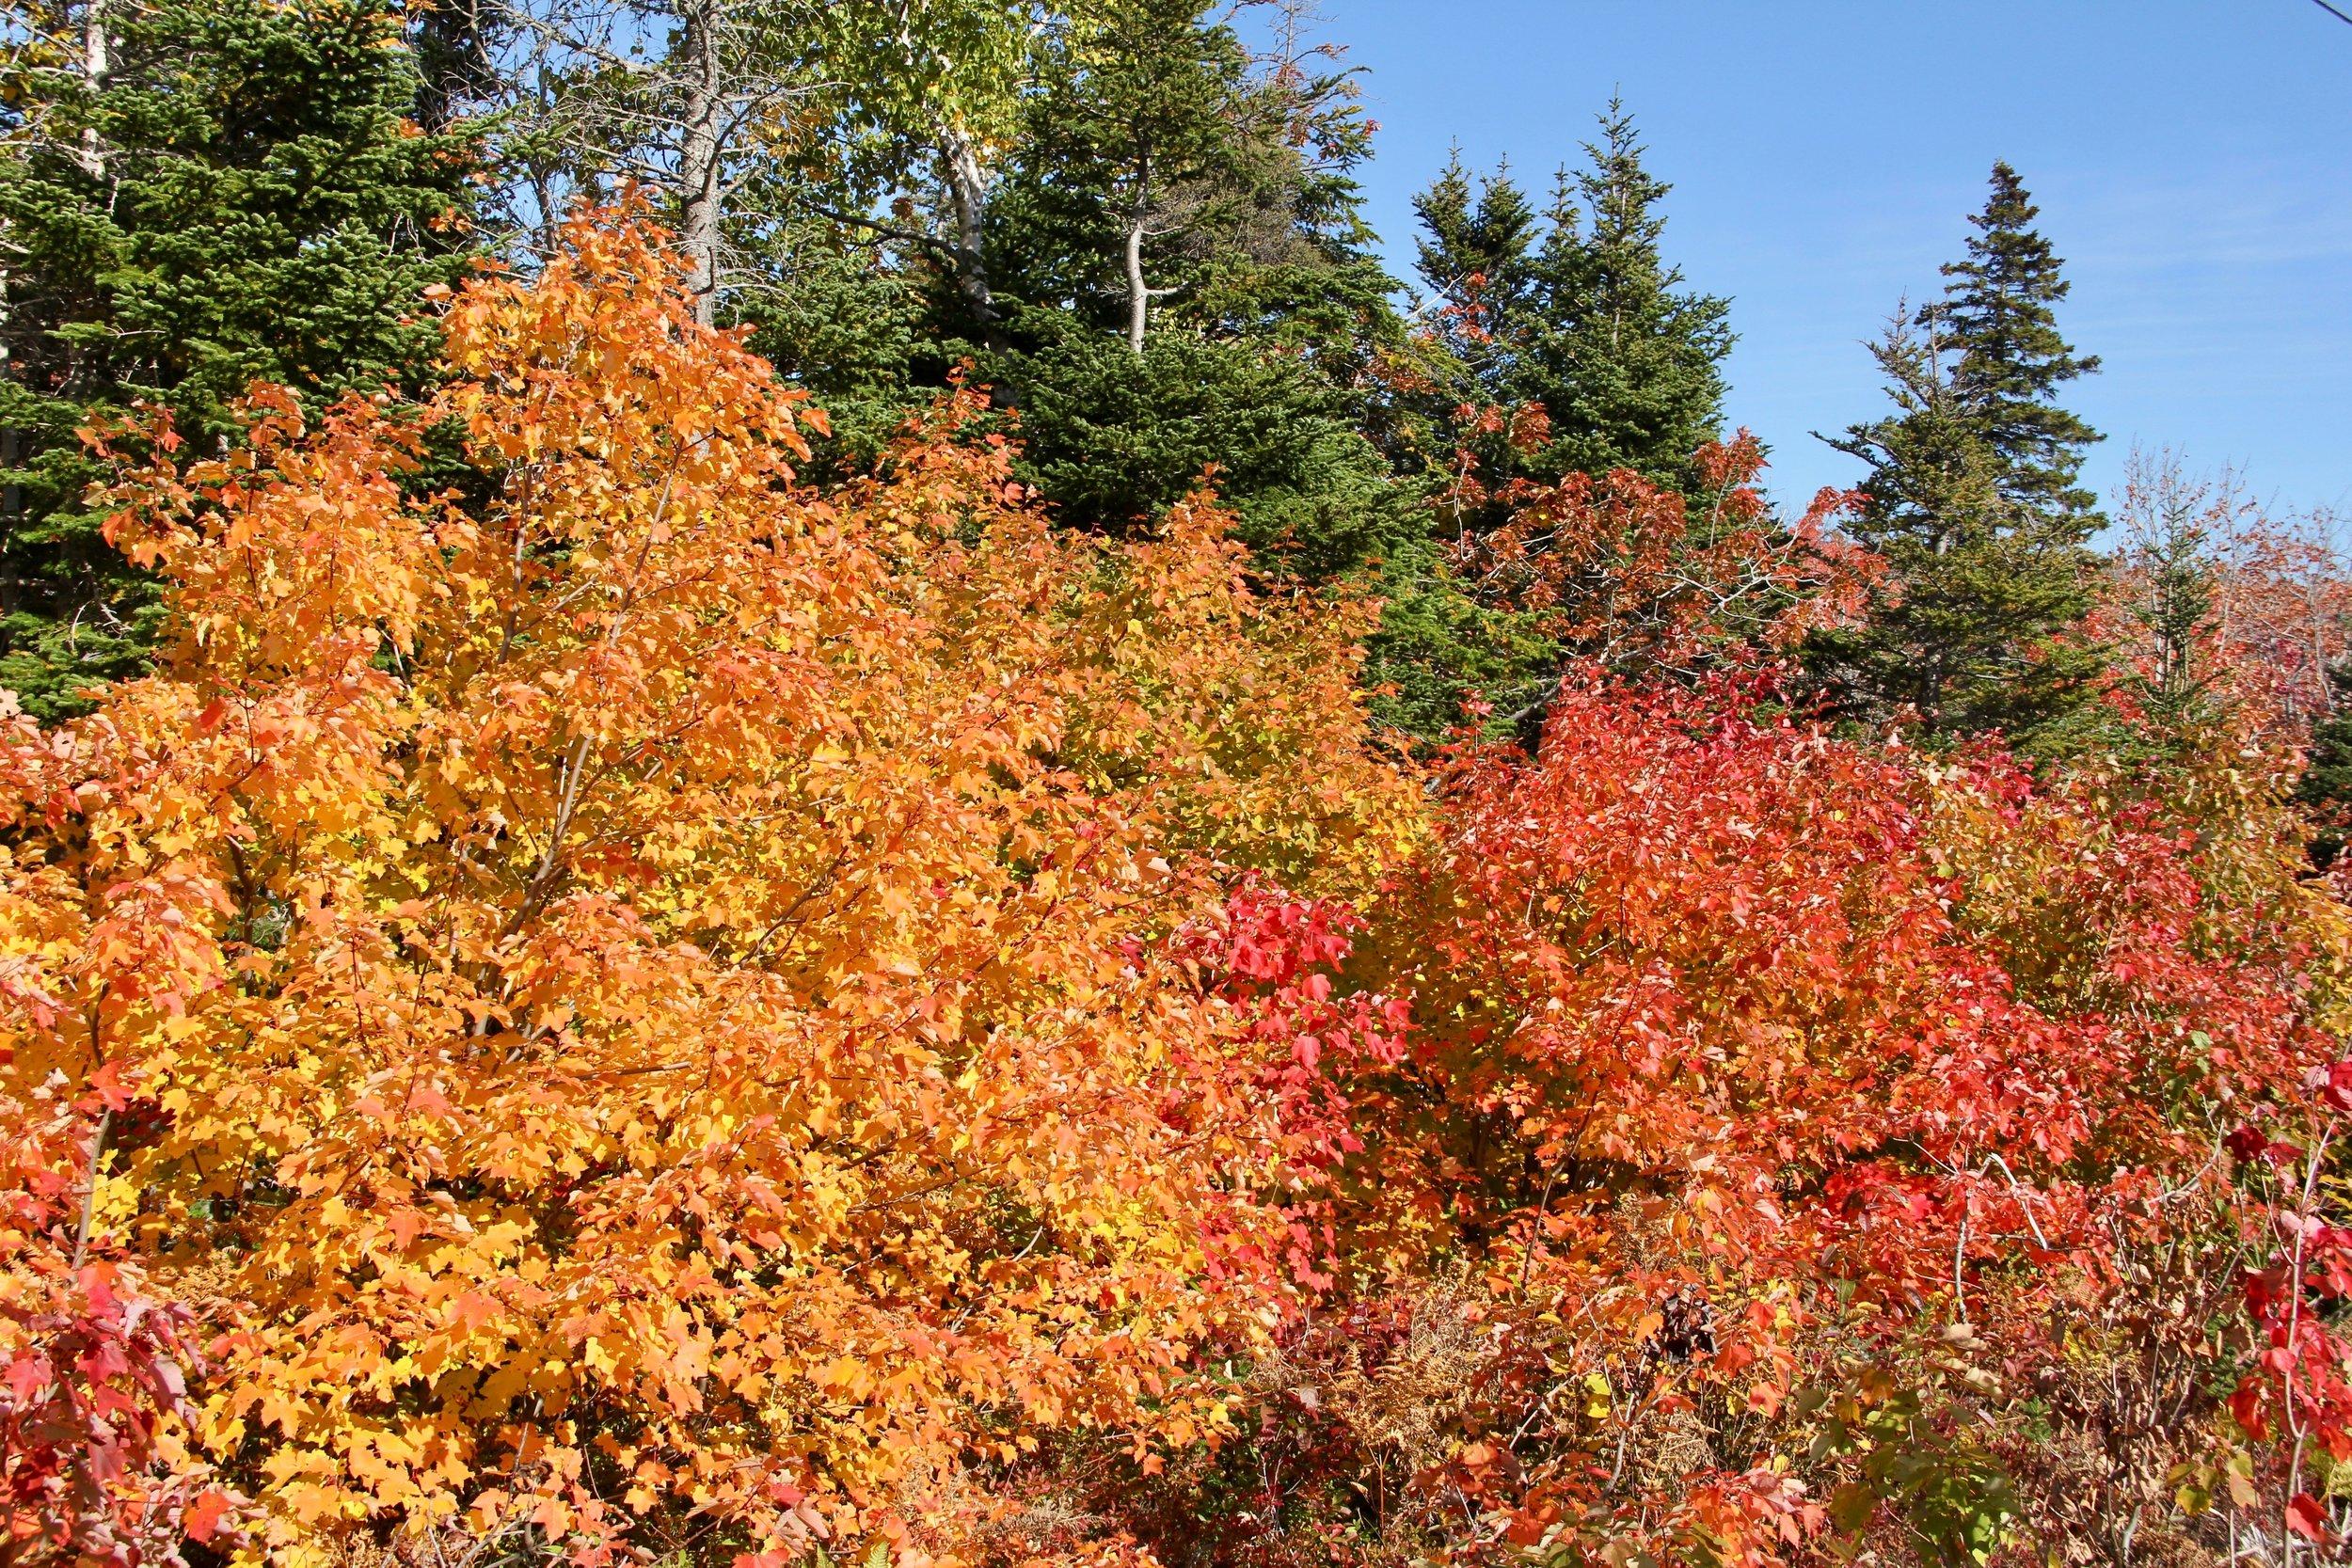 Autumn in Cape Breton